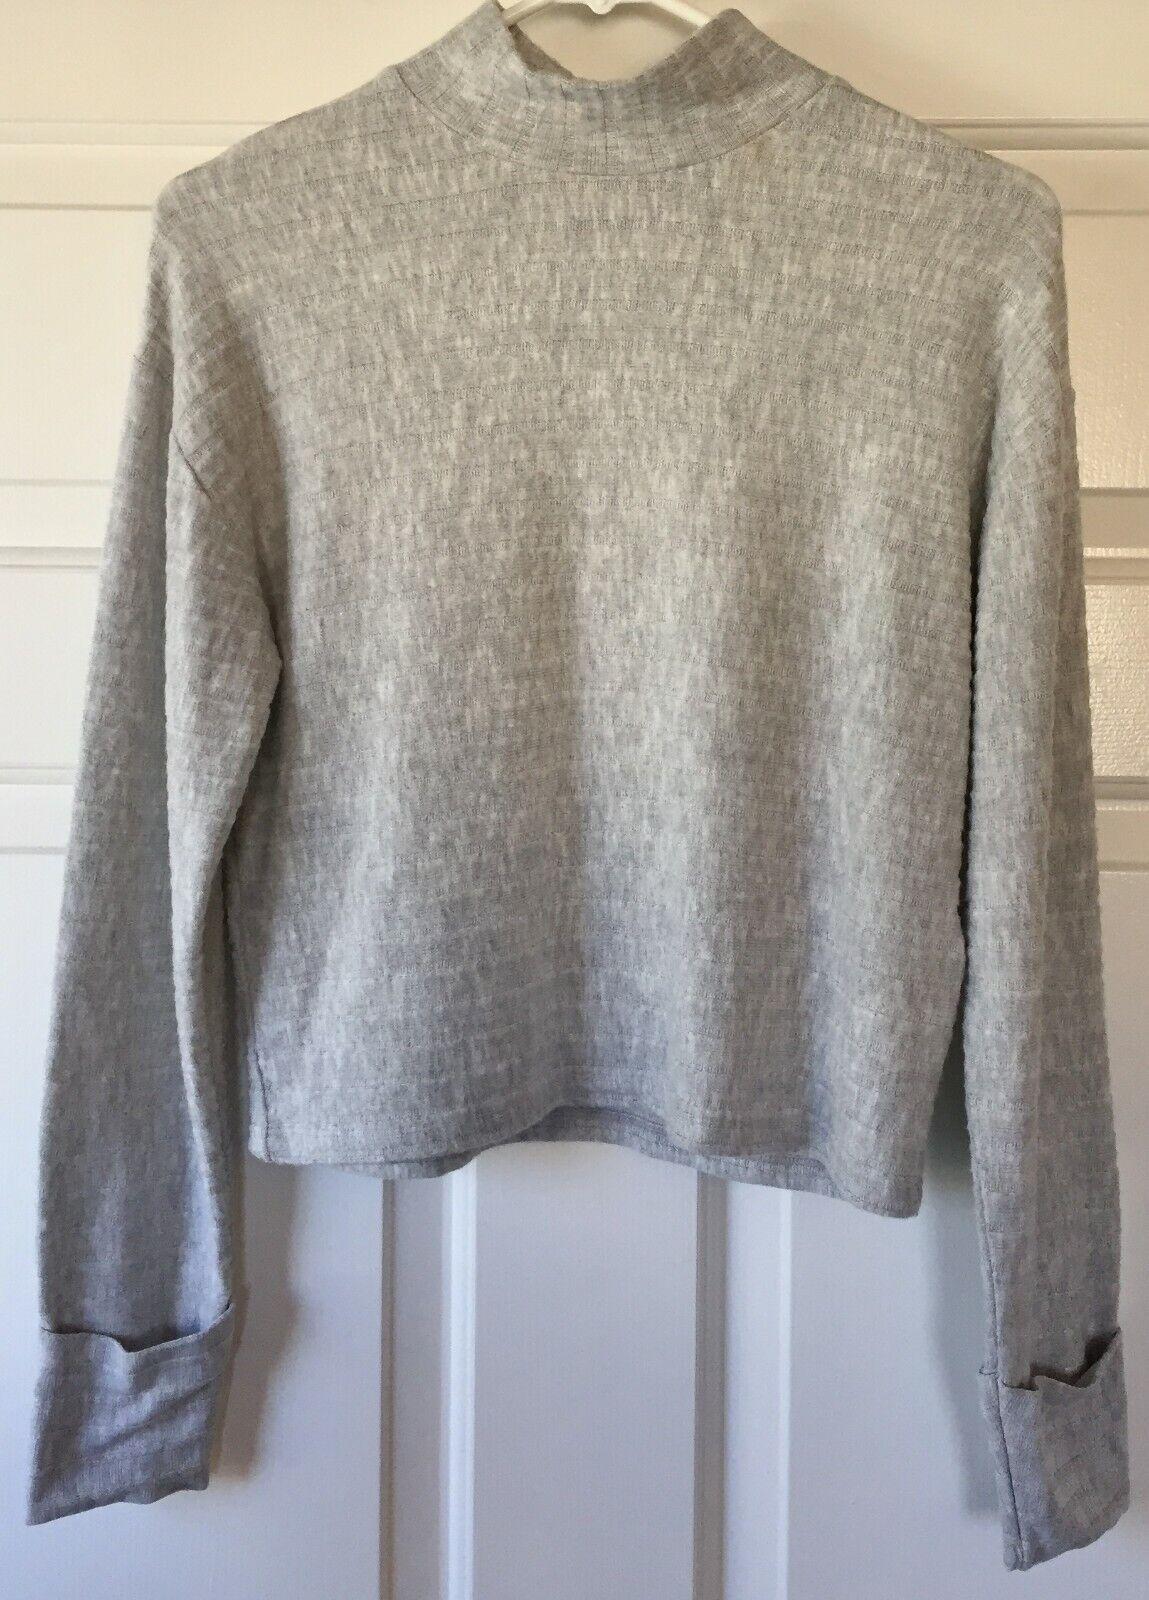 Topshop Chunky Rib Cut and Sew Sweatshirt Grey 09H20PGRY Size 4 USA